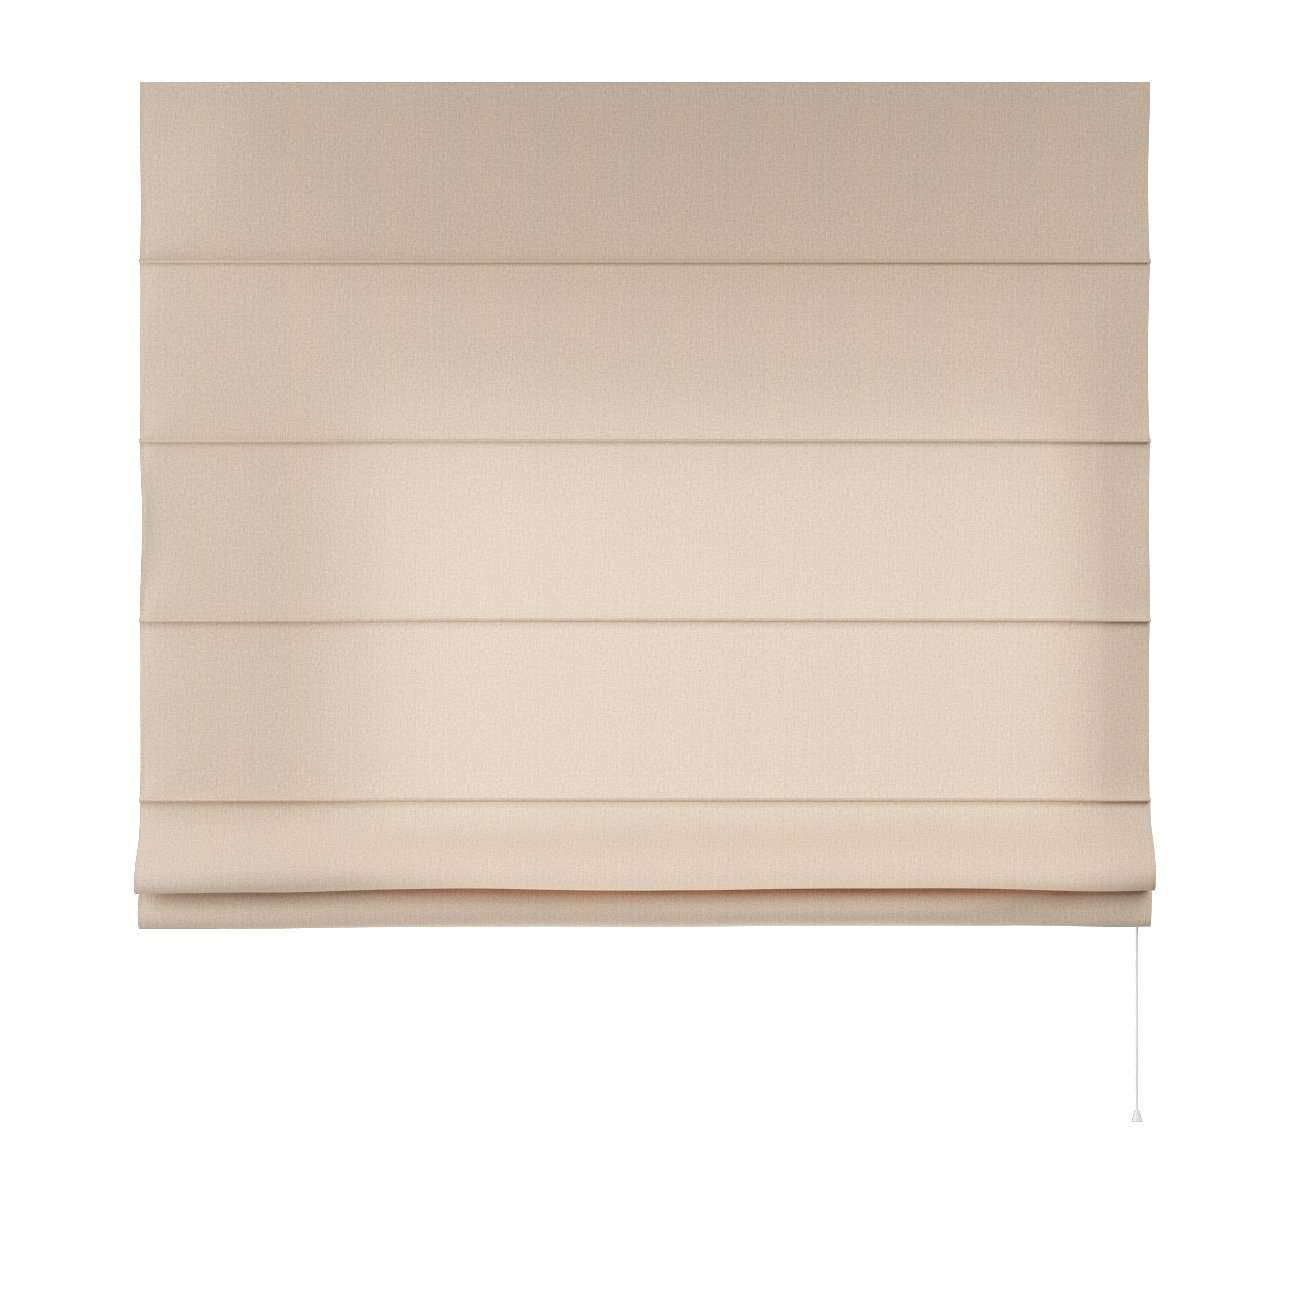 Foldegardin Capri<br/>Uden flæsekant 80 x 170 cm fra kollektionen Edinburgh, Stof: 115-78